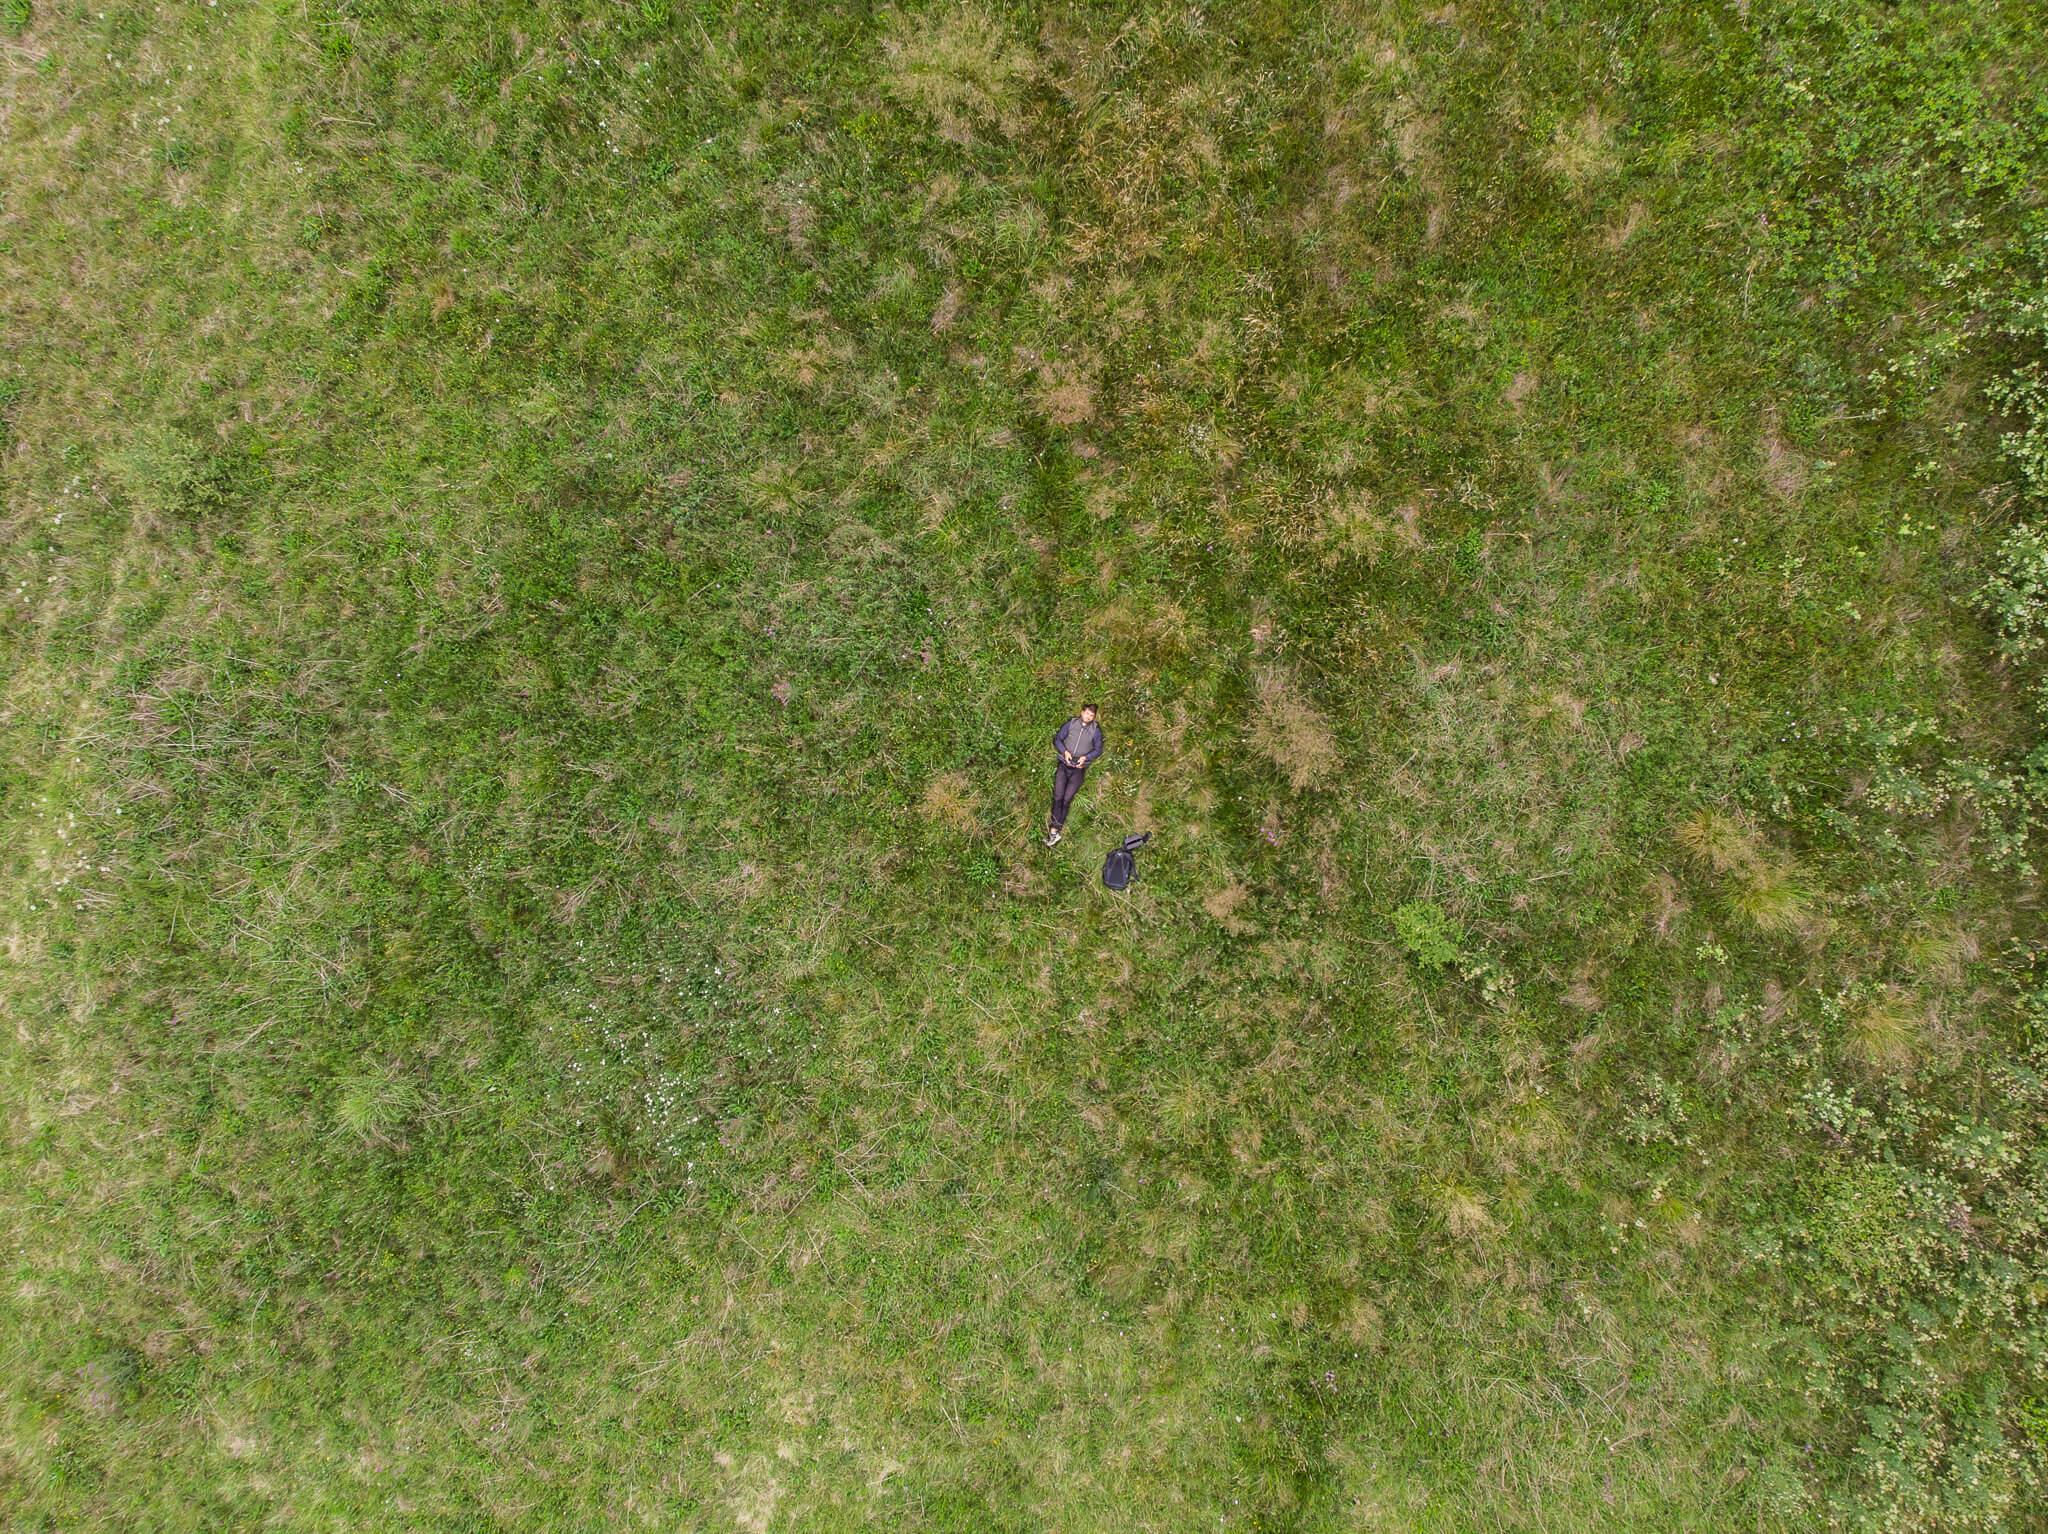 Drone_DJI_0167-2_WHP_webHD